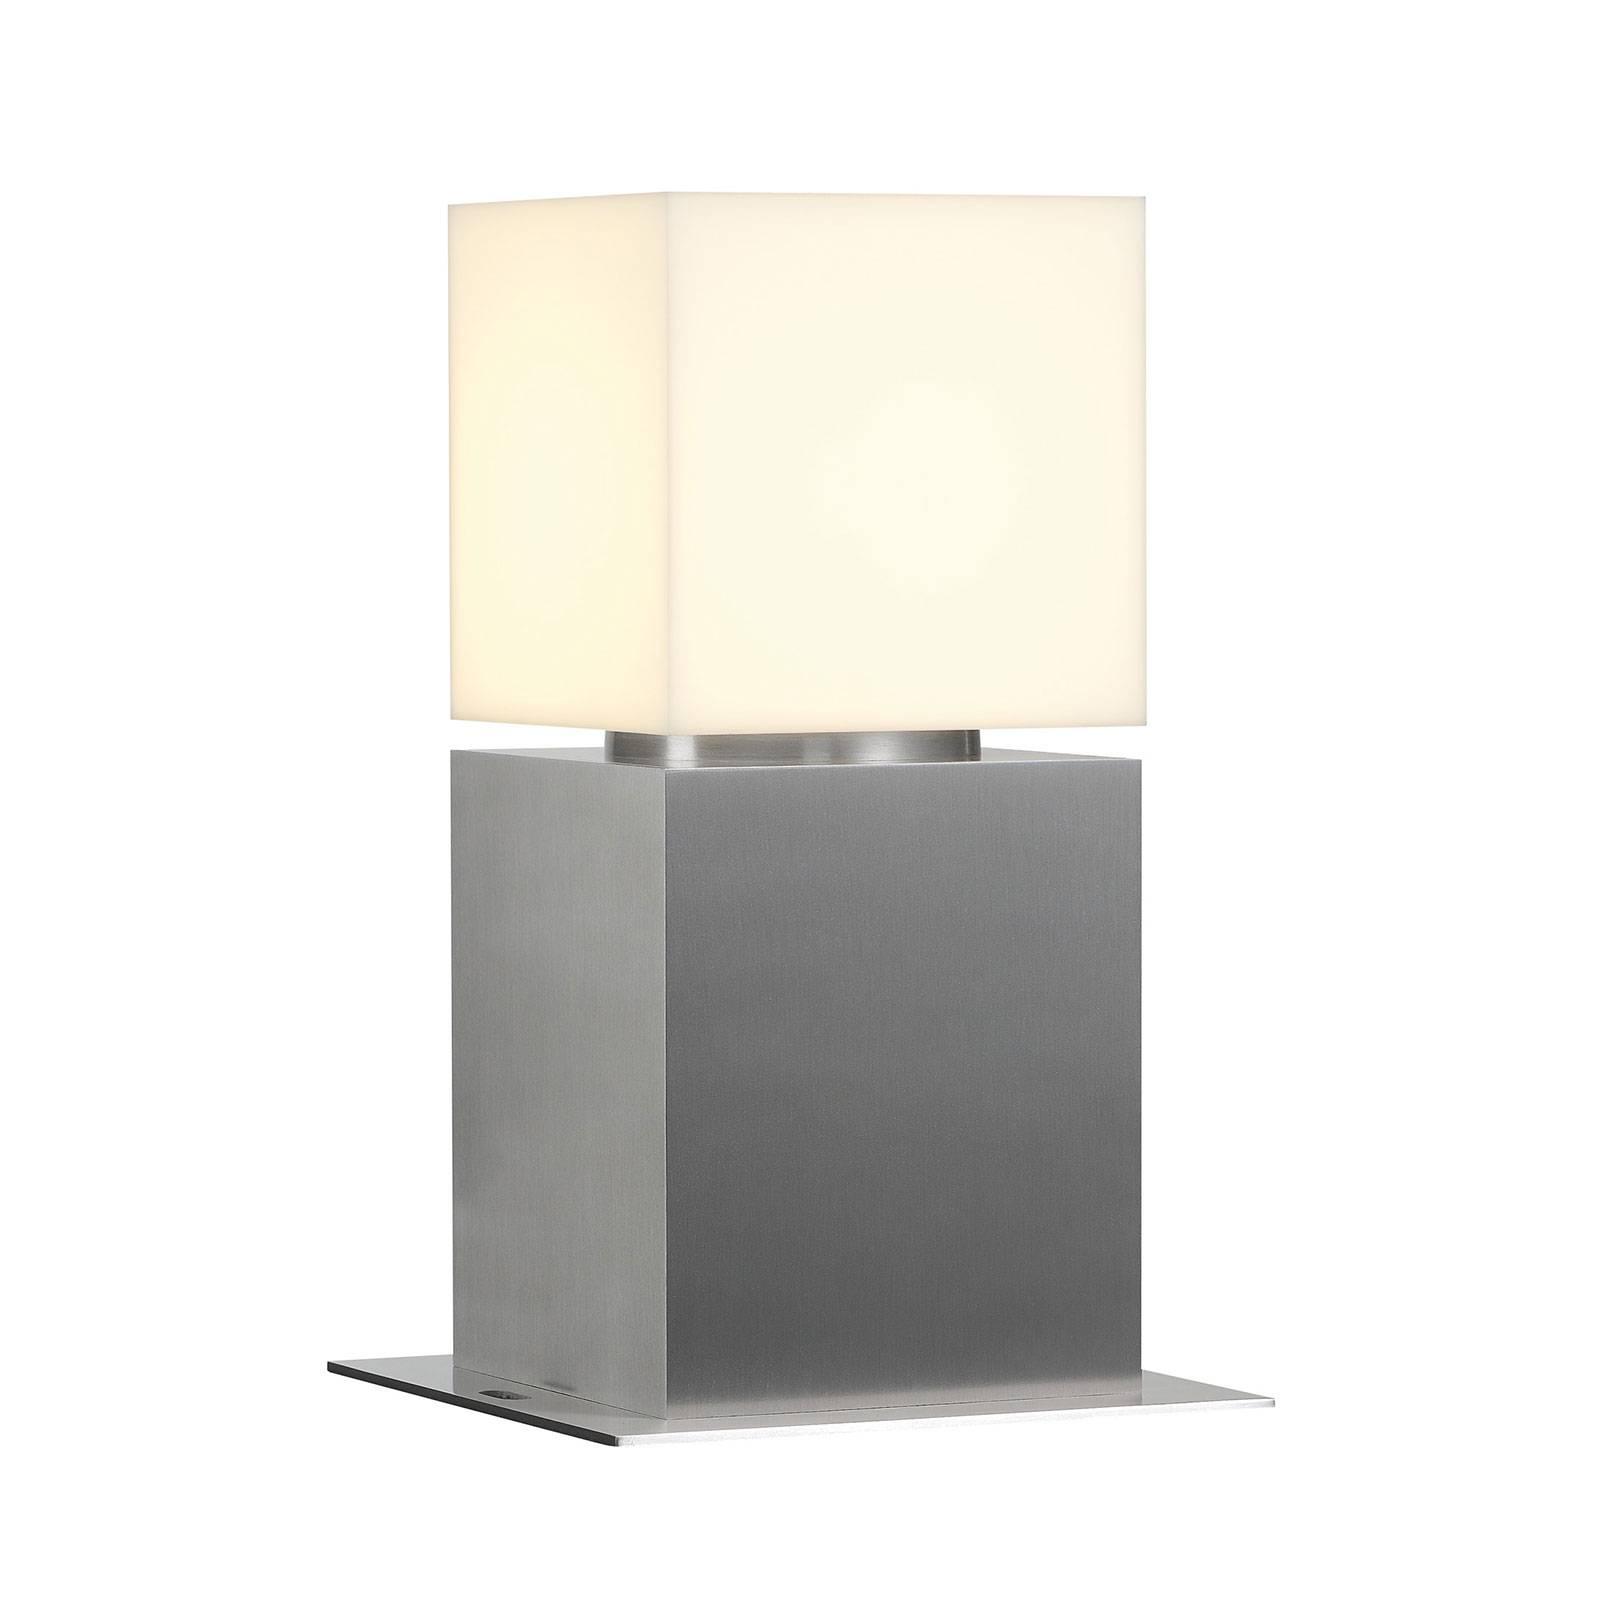 SLV Square Pole 30 LED-Sockelleuchte, Höhe 30 cm